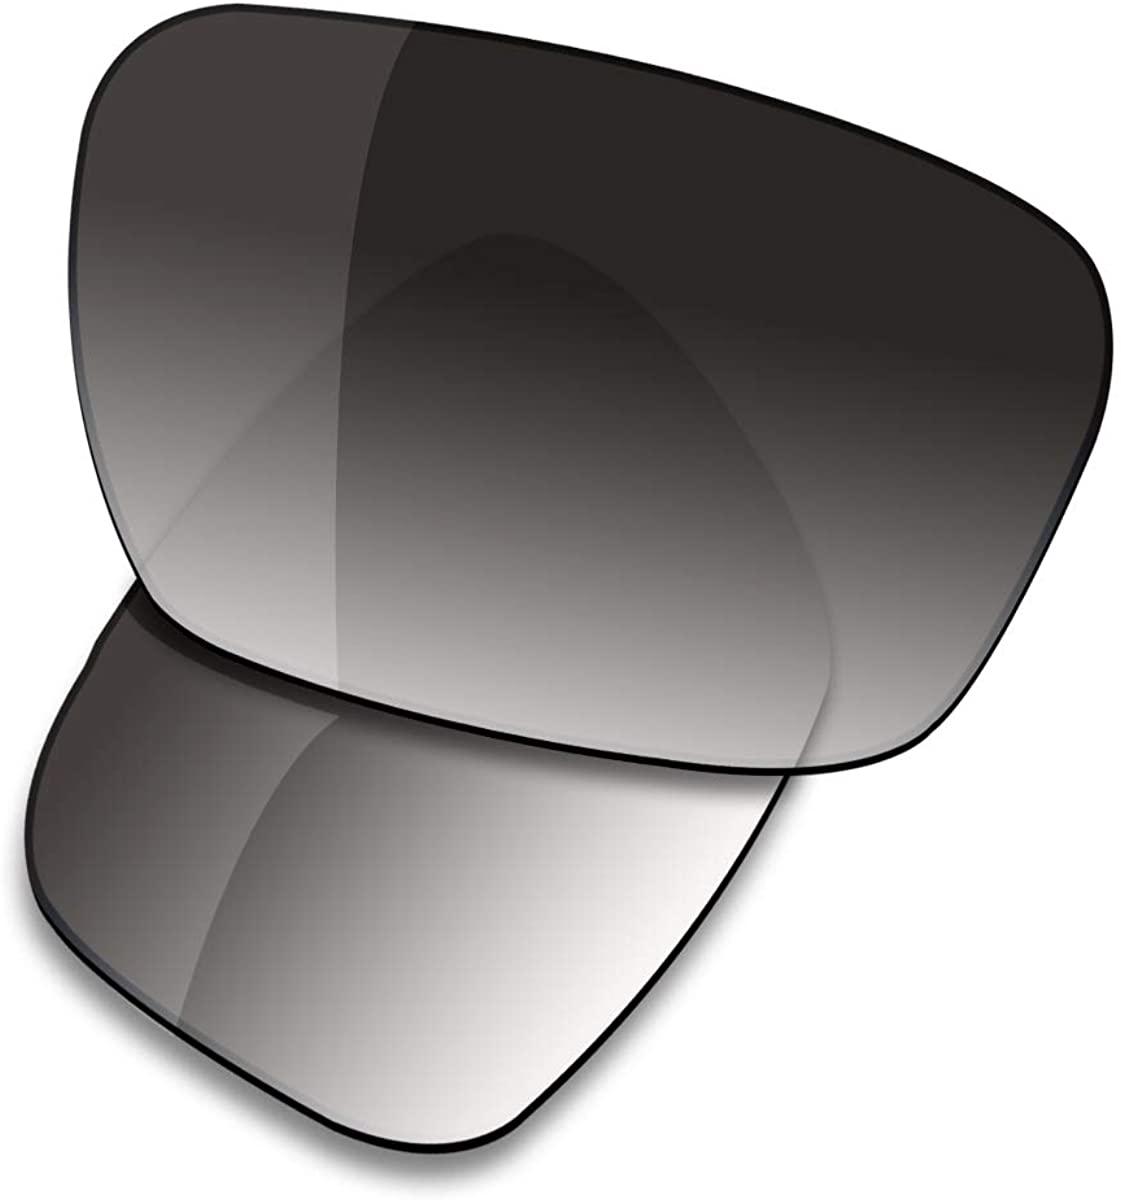 Saucer Premium Replacement Lenses for Oakley Badman OO6020 Sunglasses